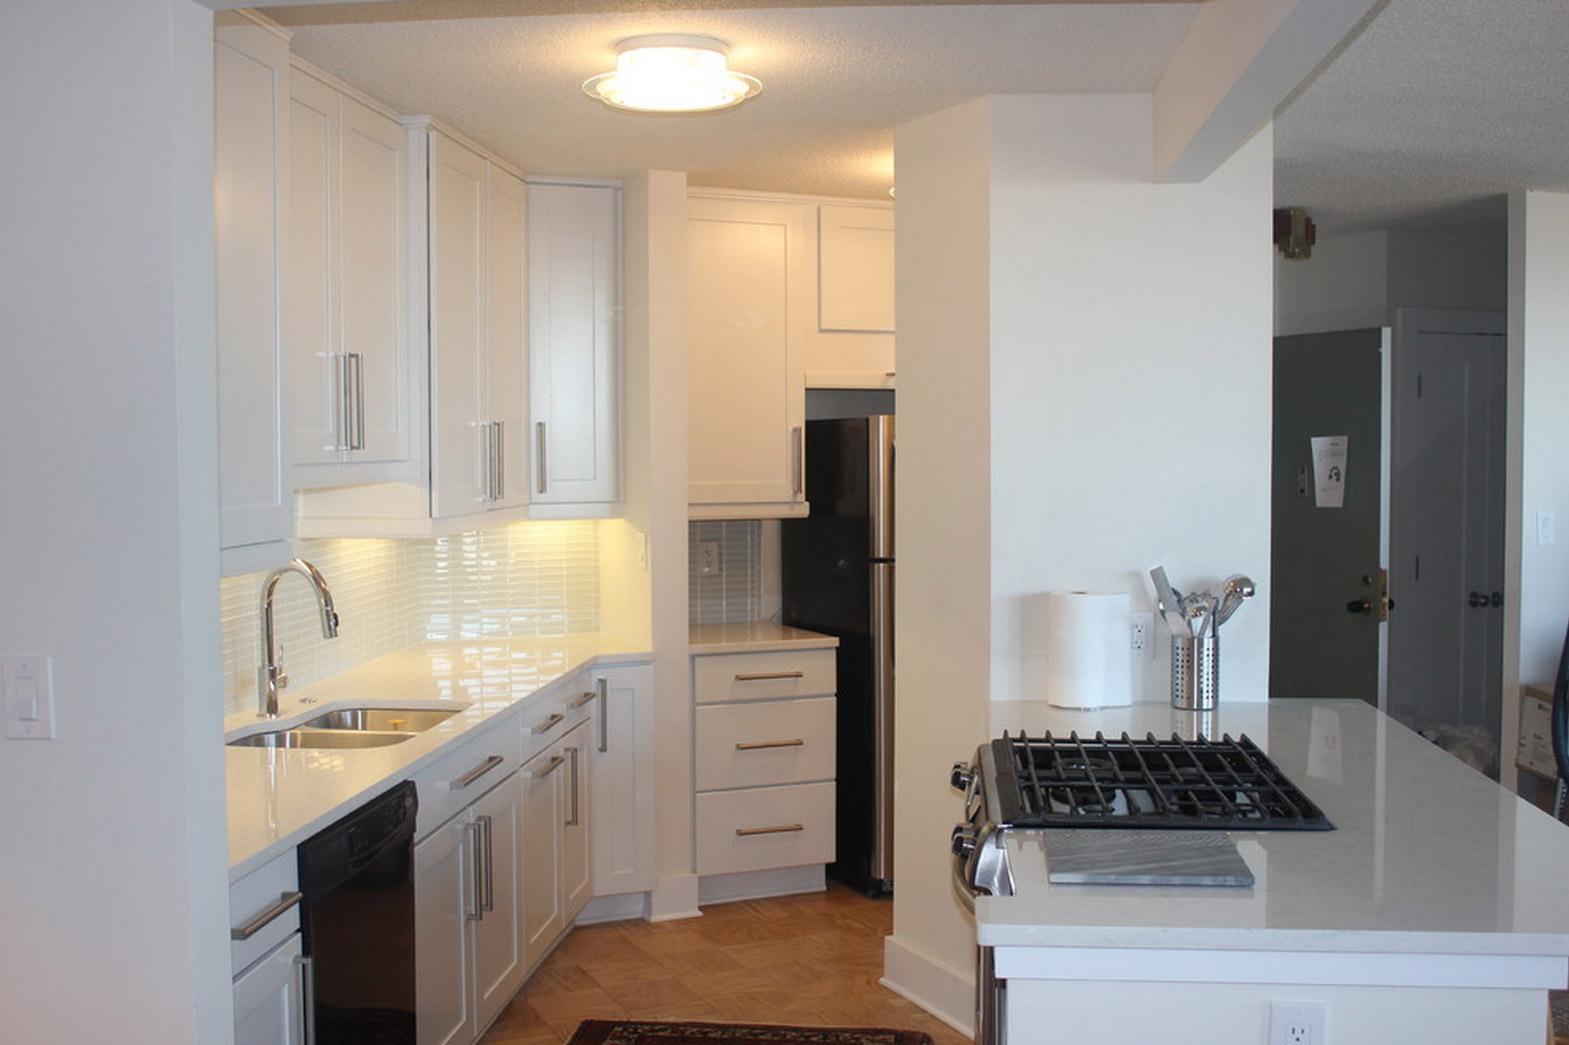 Photos From An Alexandria Condo Home Kitchen Remodel